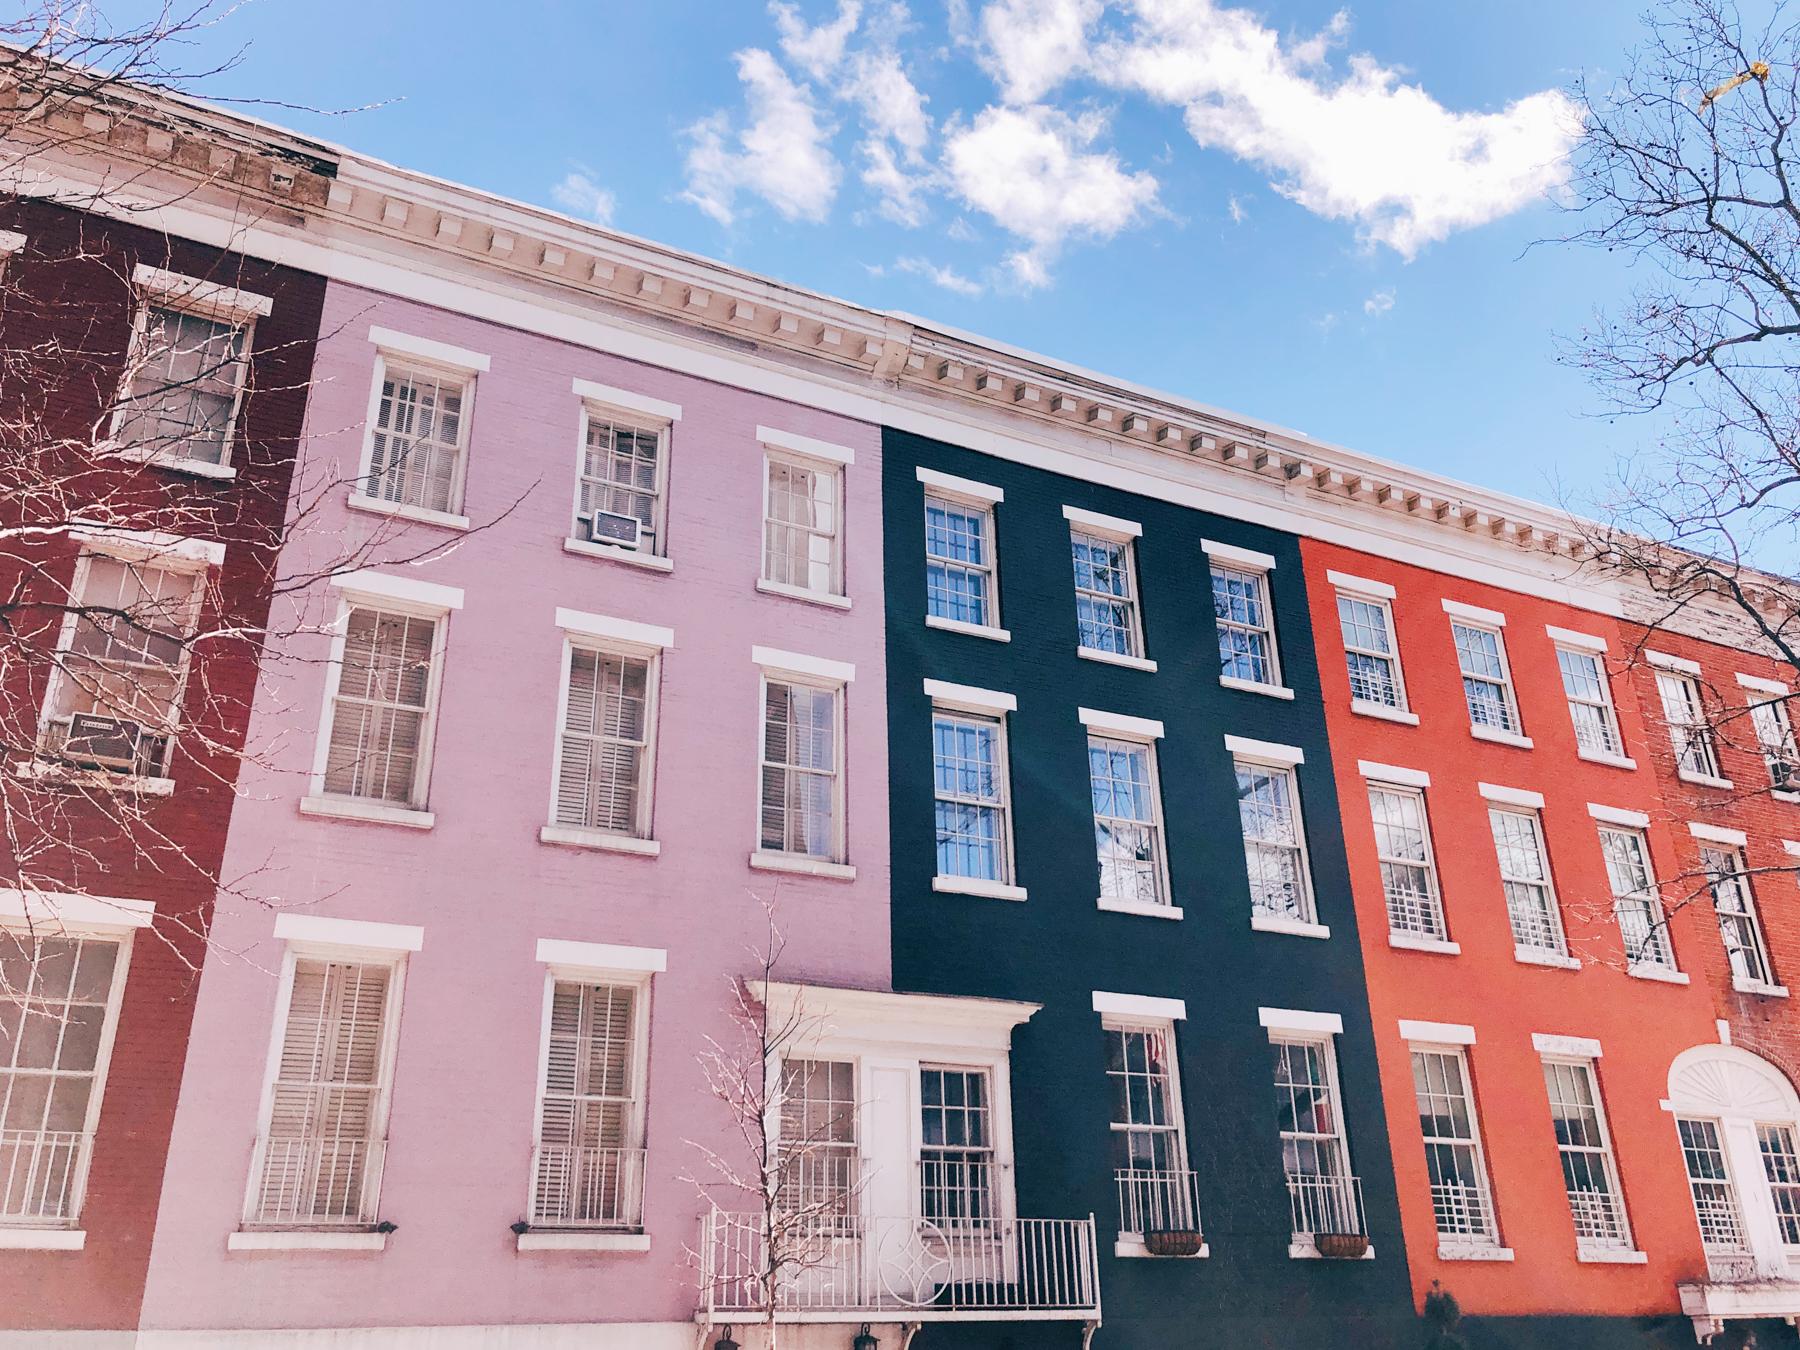 Cute houses on MacDougal St.